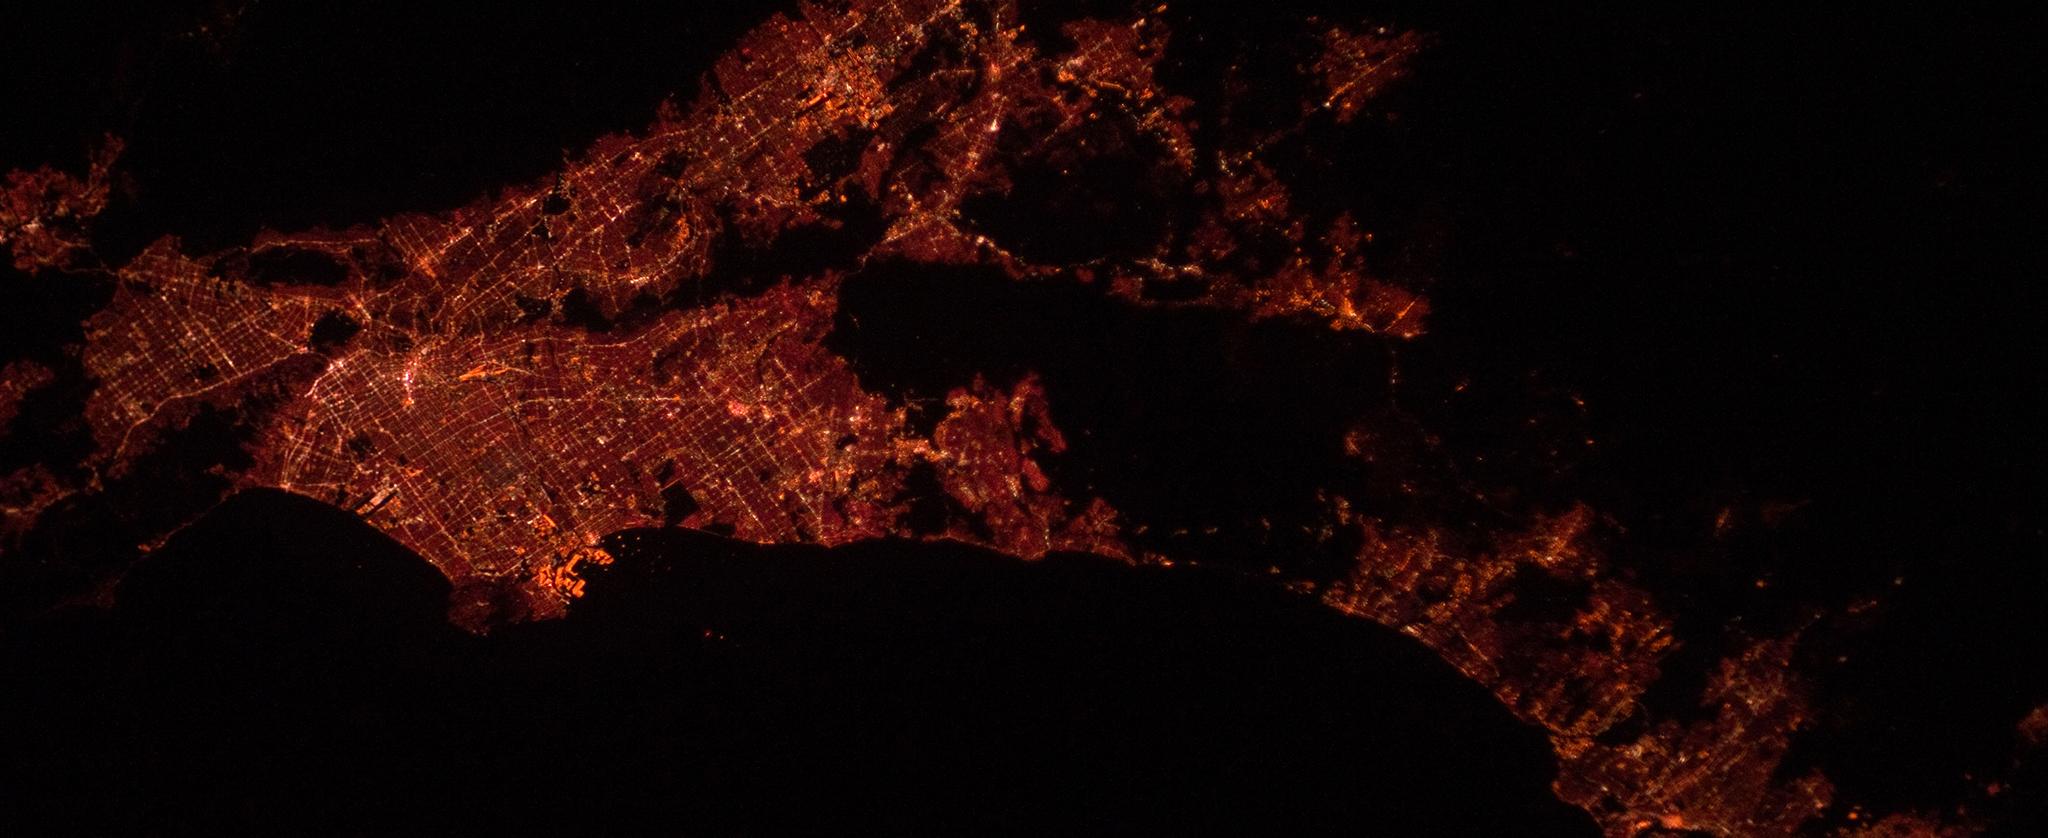 Los Angeles Area at Night from NASA's Marshall Space Flight Center